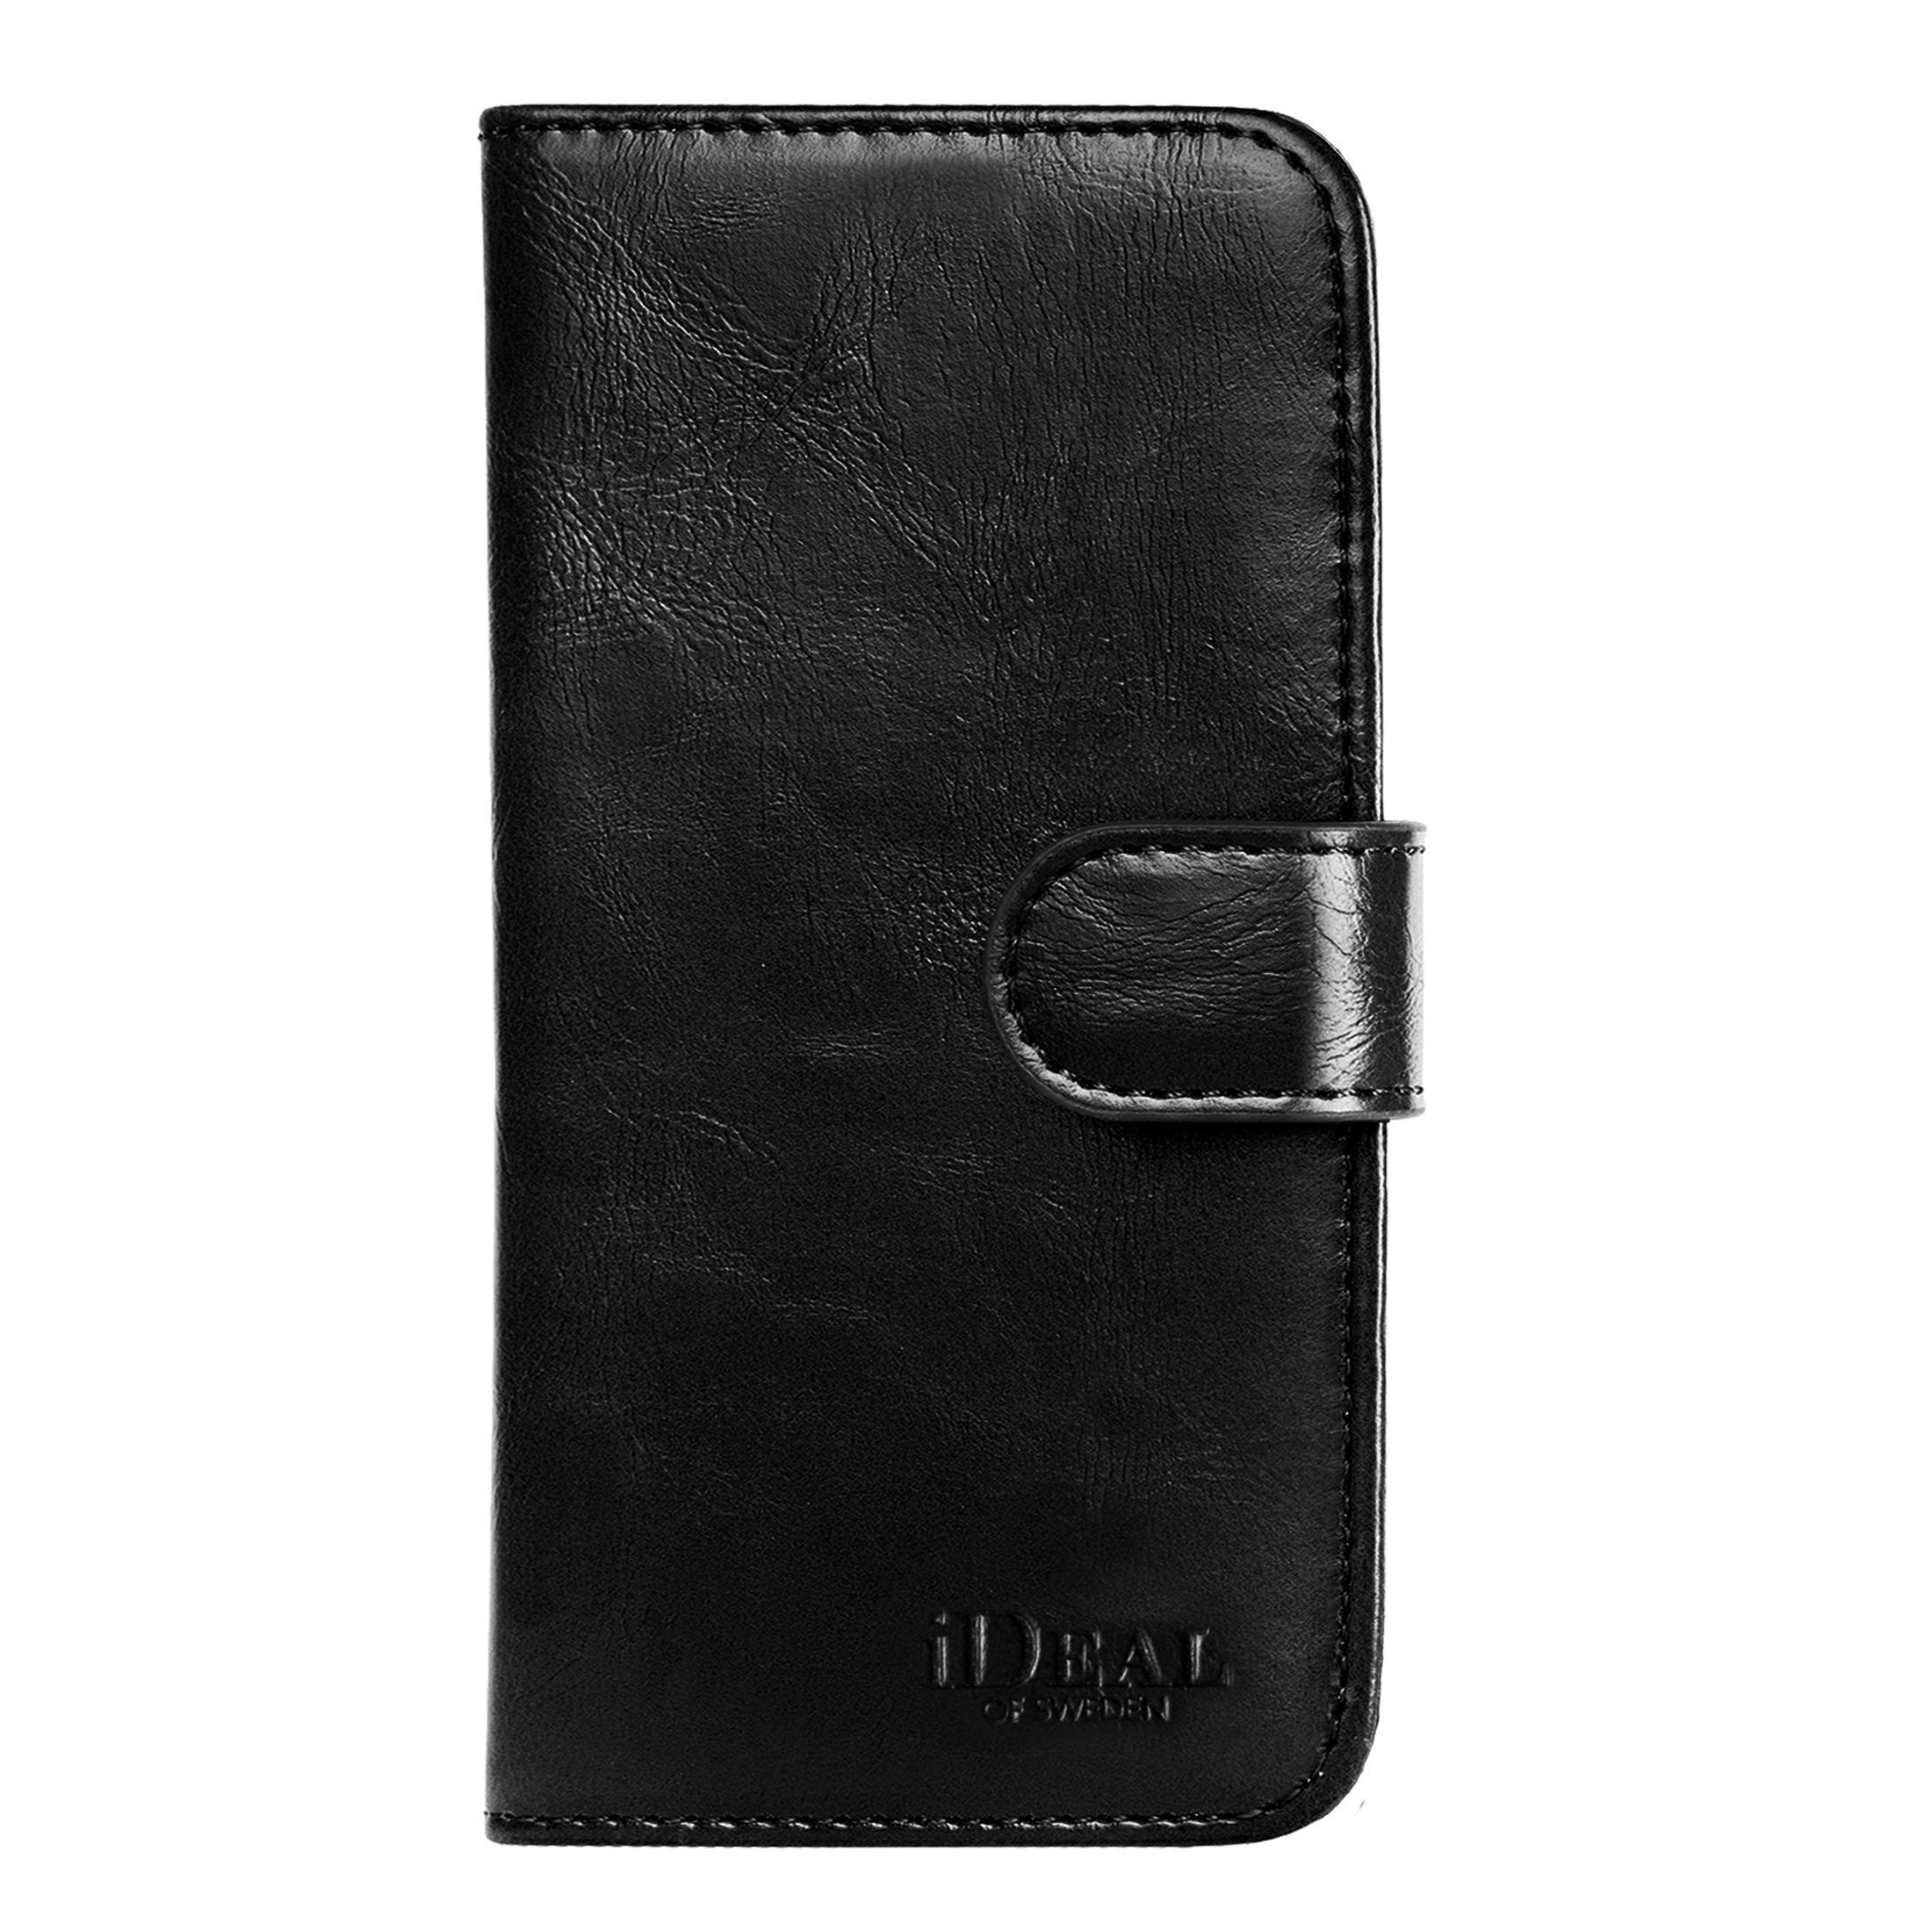 Magnet Wallet+ iPhone 12 Mini Black